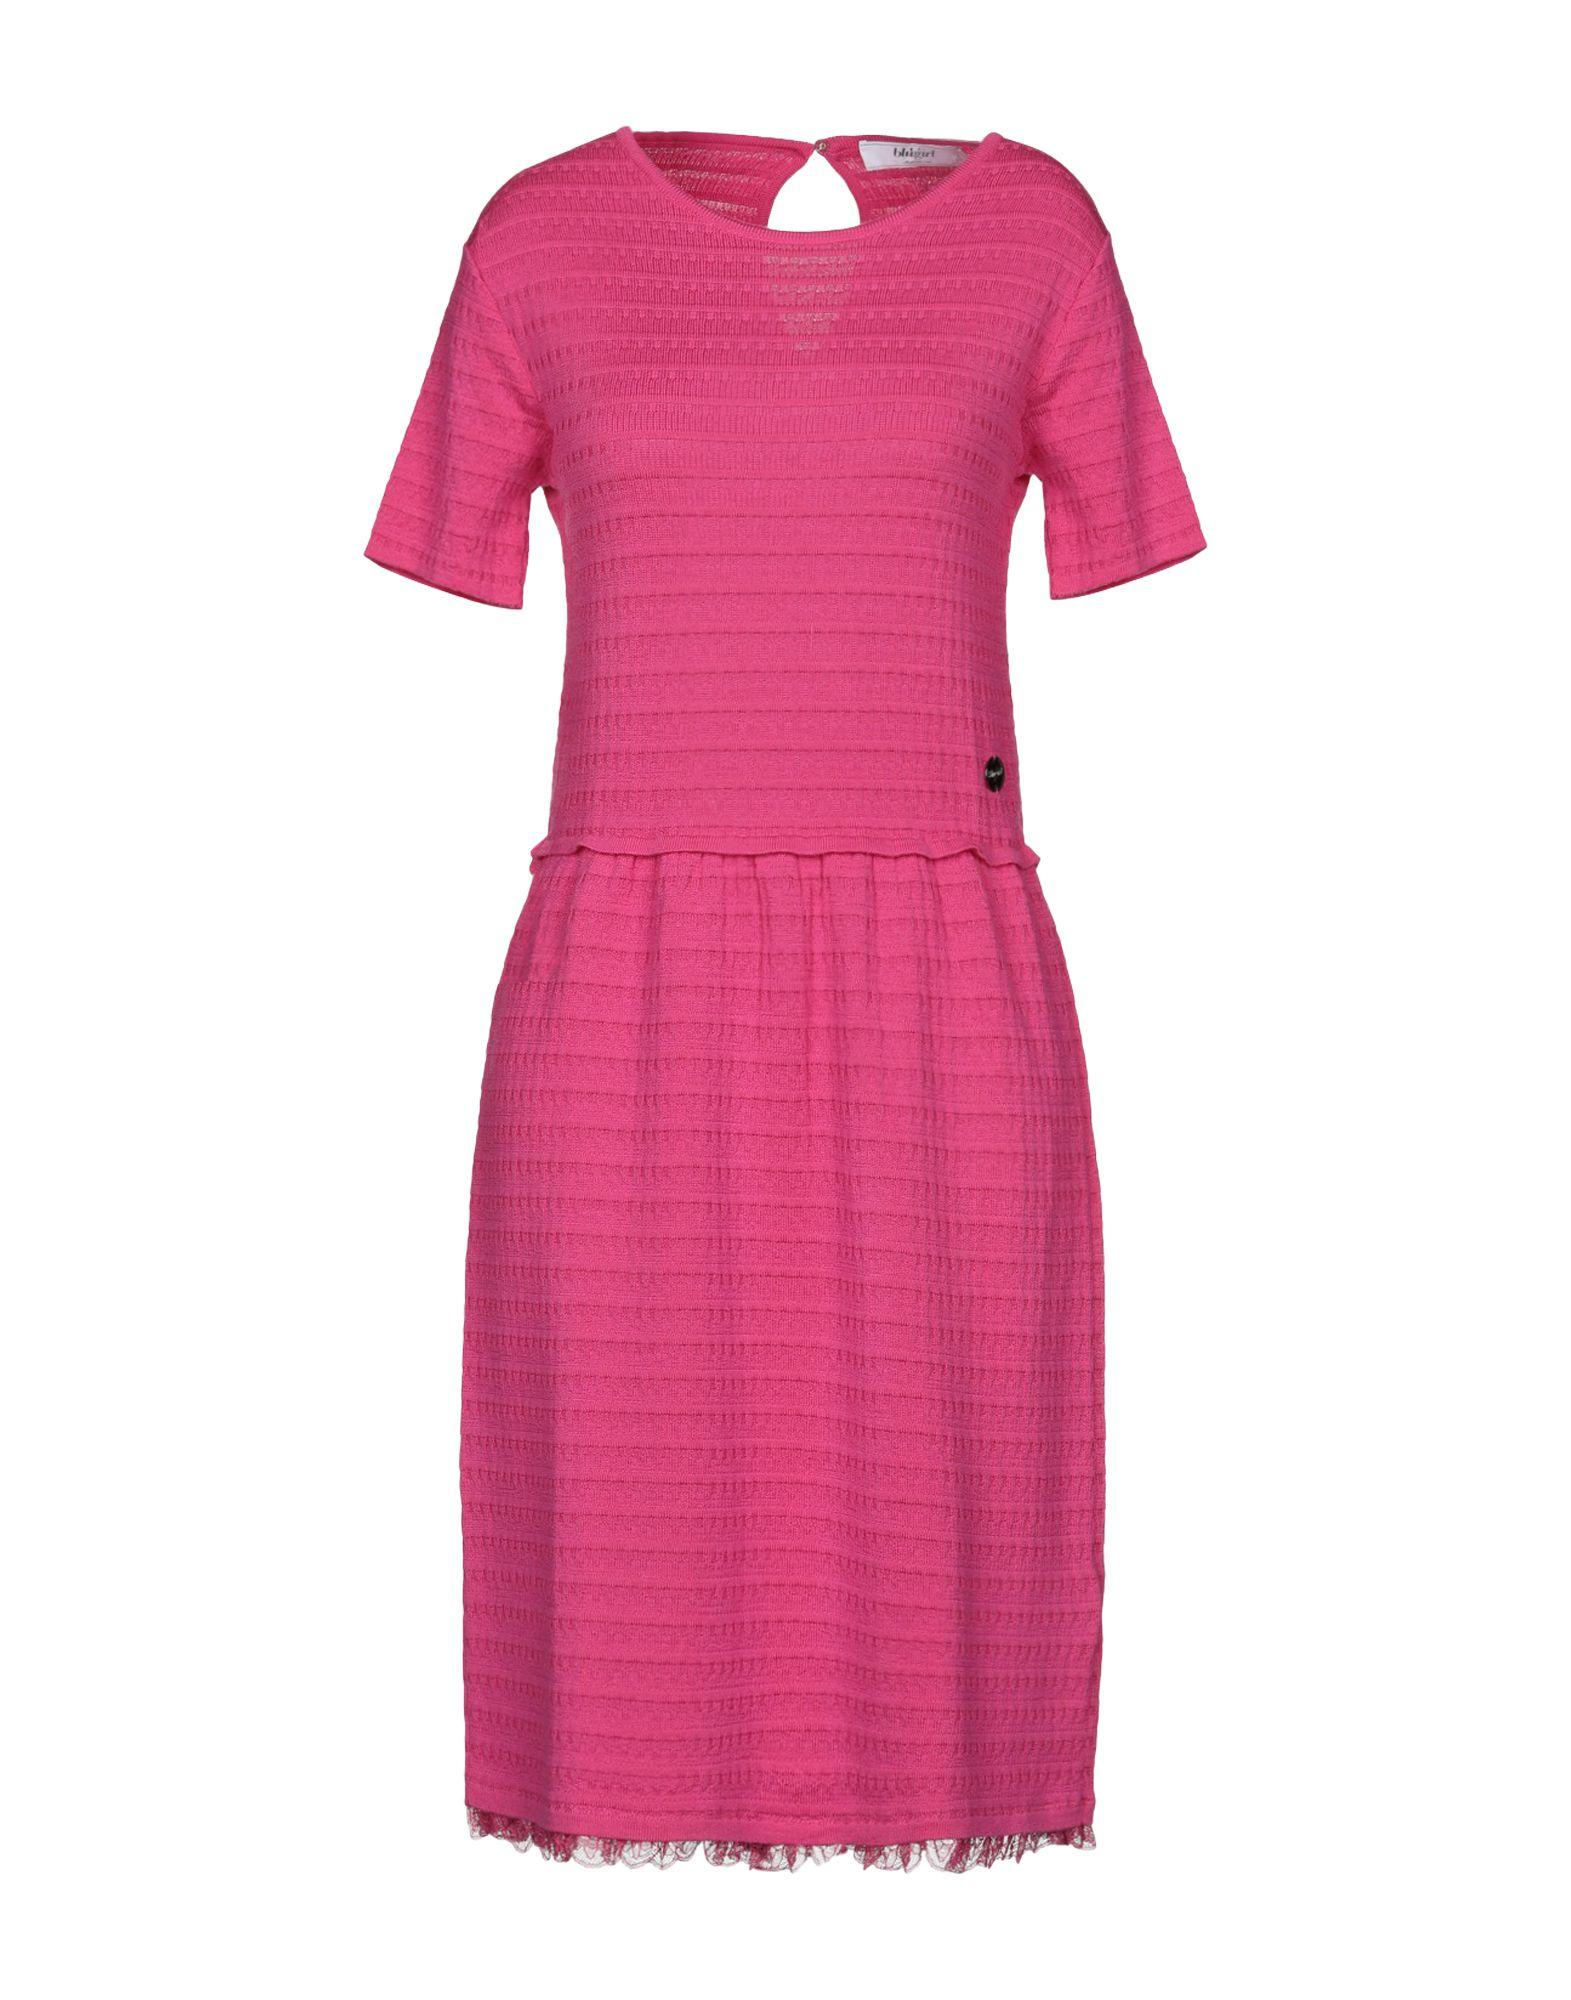 BLUGIRL BLUMARINE | BLUGIRL BLUMARINE Short dresses | Goxip